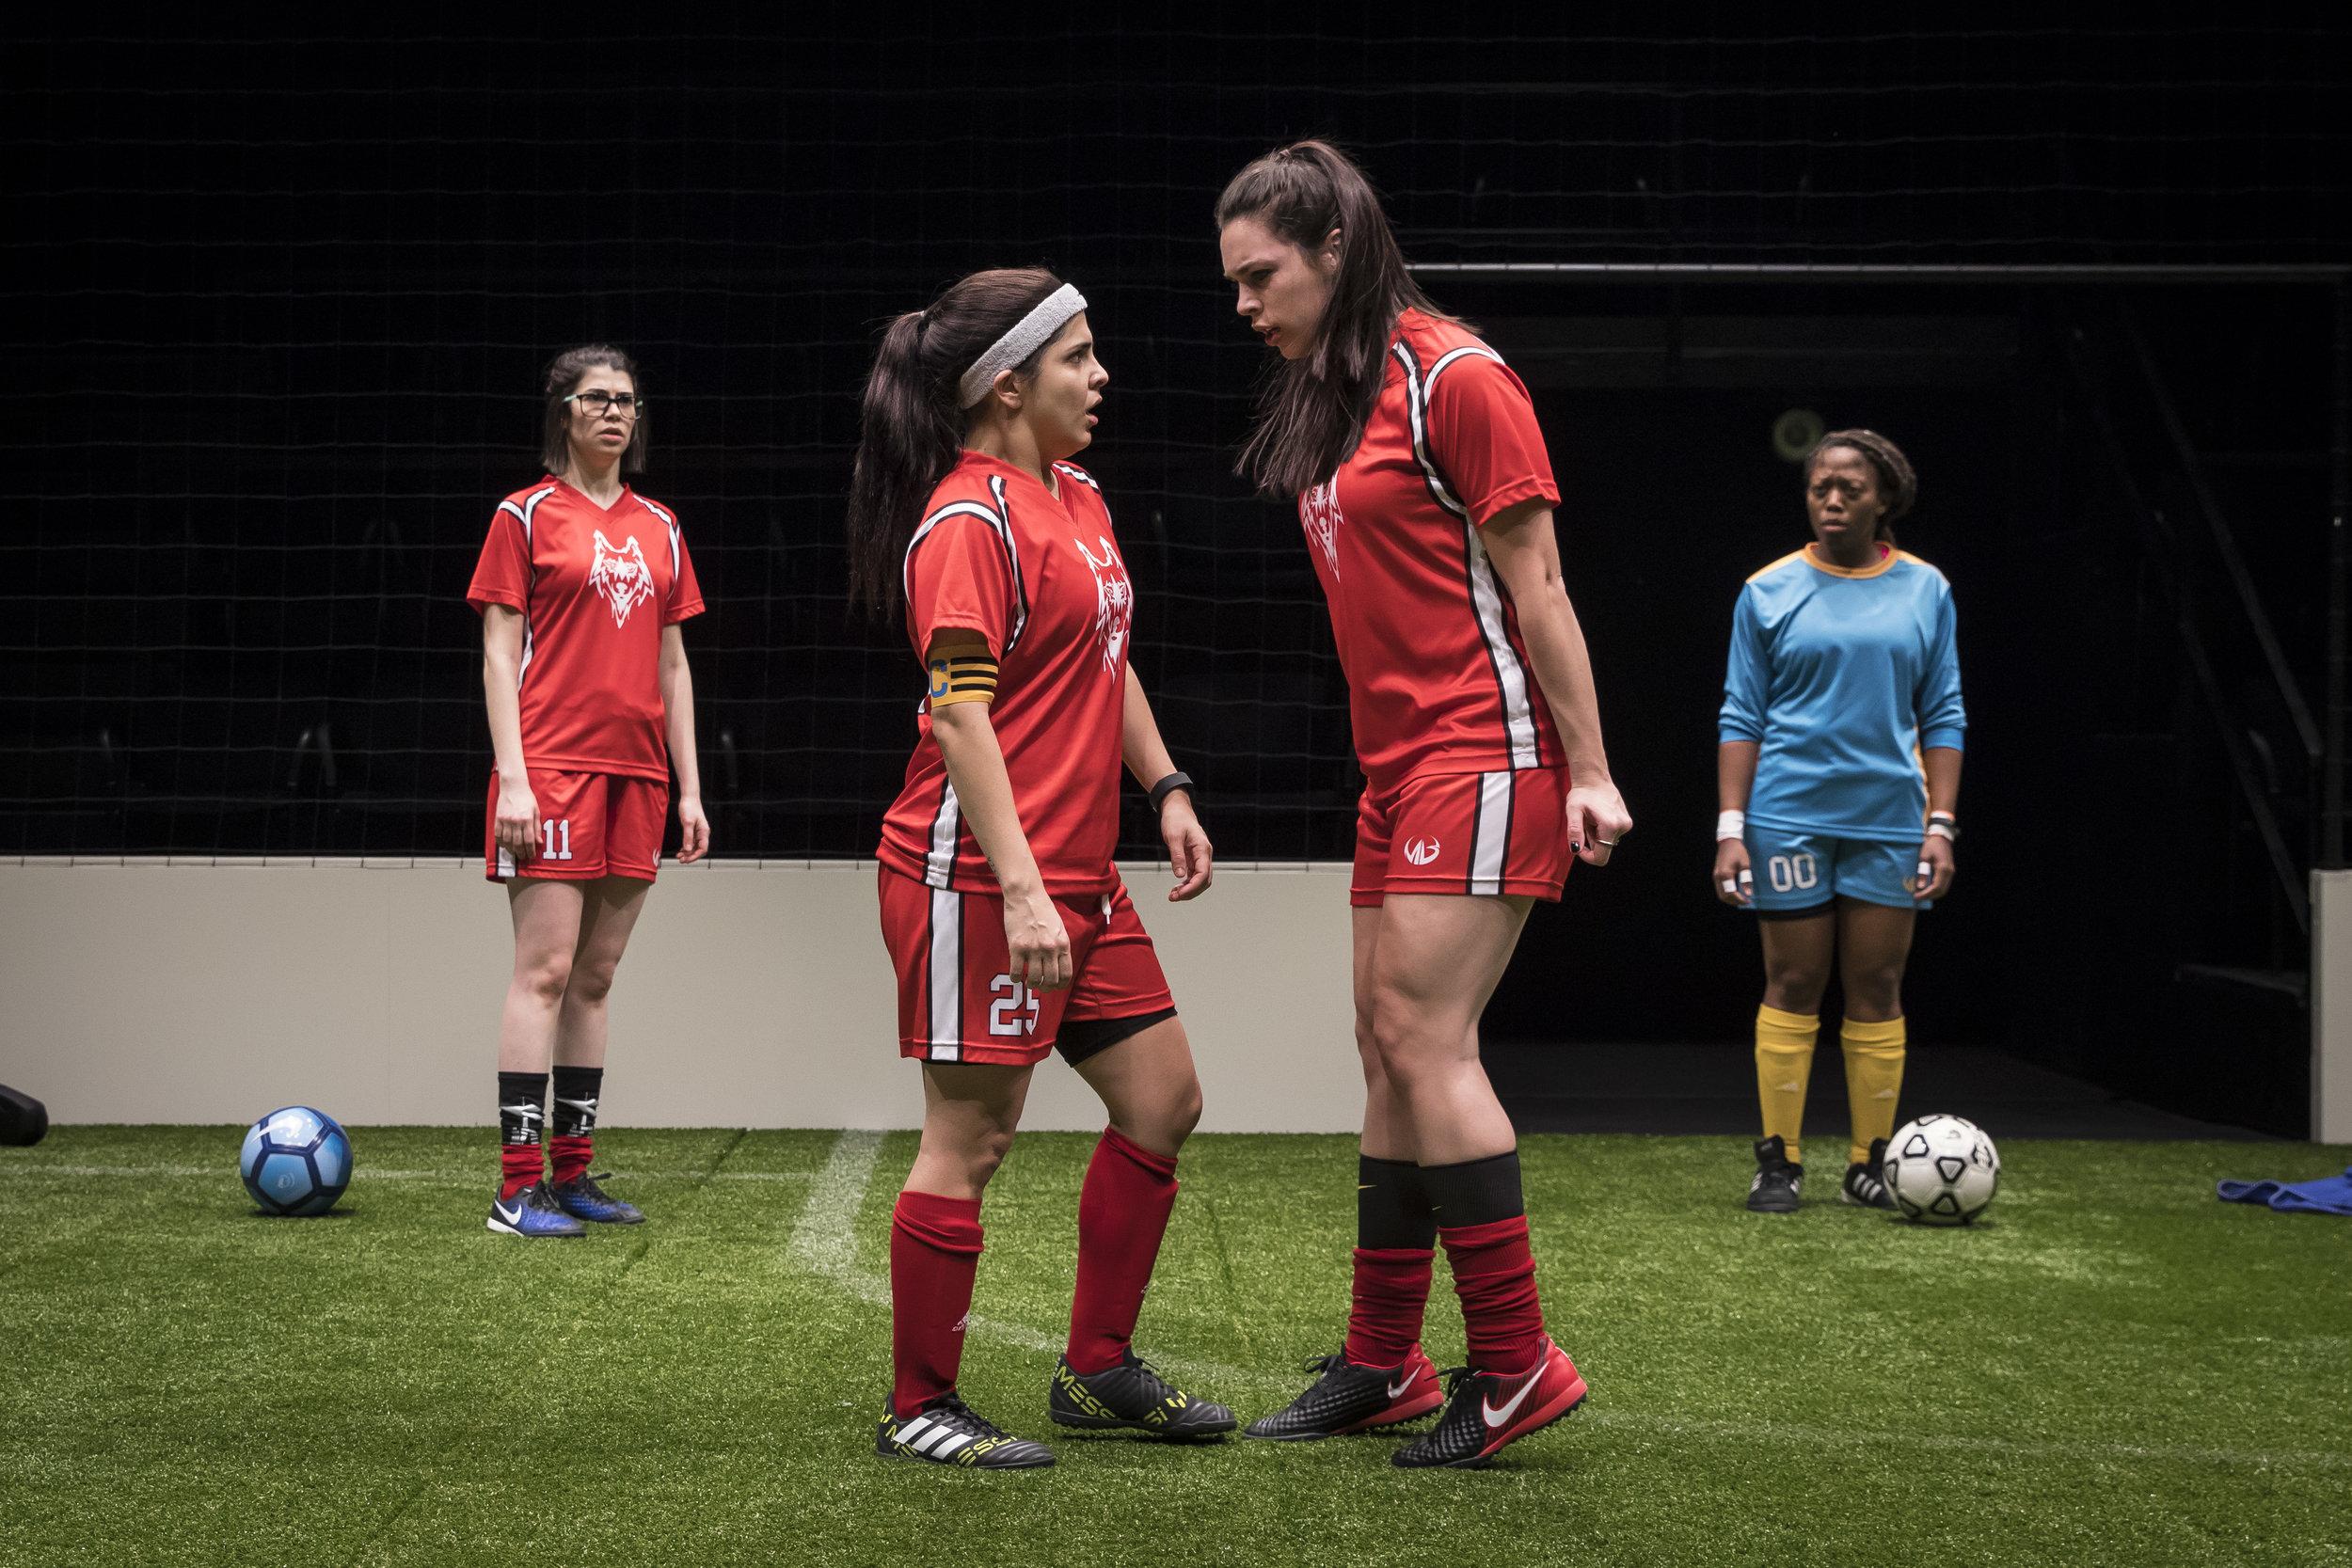 Sarah Price (#11), Isa Arciniegas (#25), Natalie Joyce  (#7) and  Angela Alise (#00) in  The Wolves by Sarah DeLappe. Photo credit: Liz Lauren